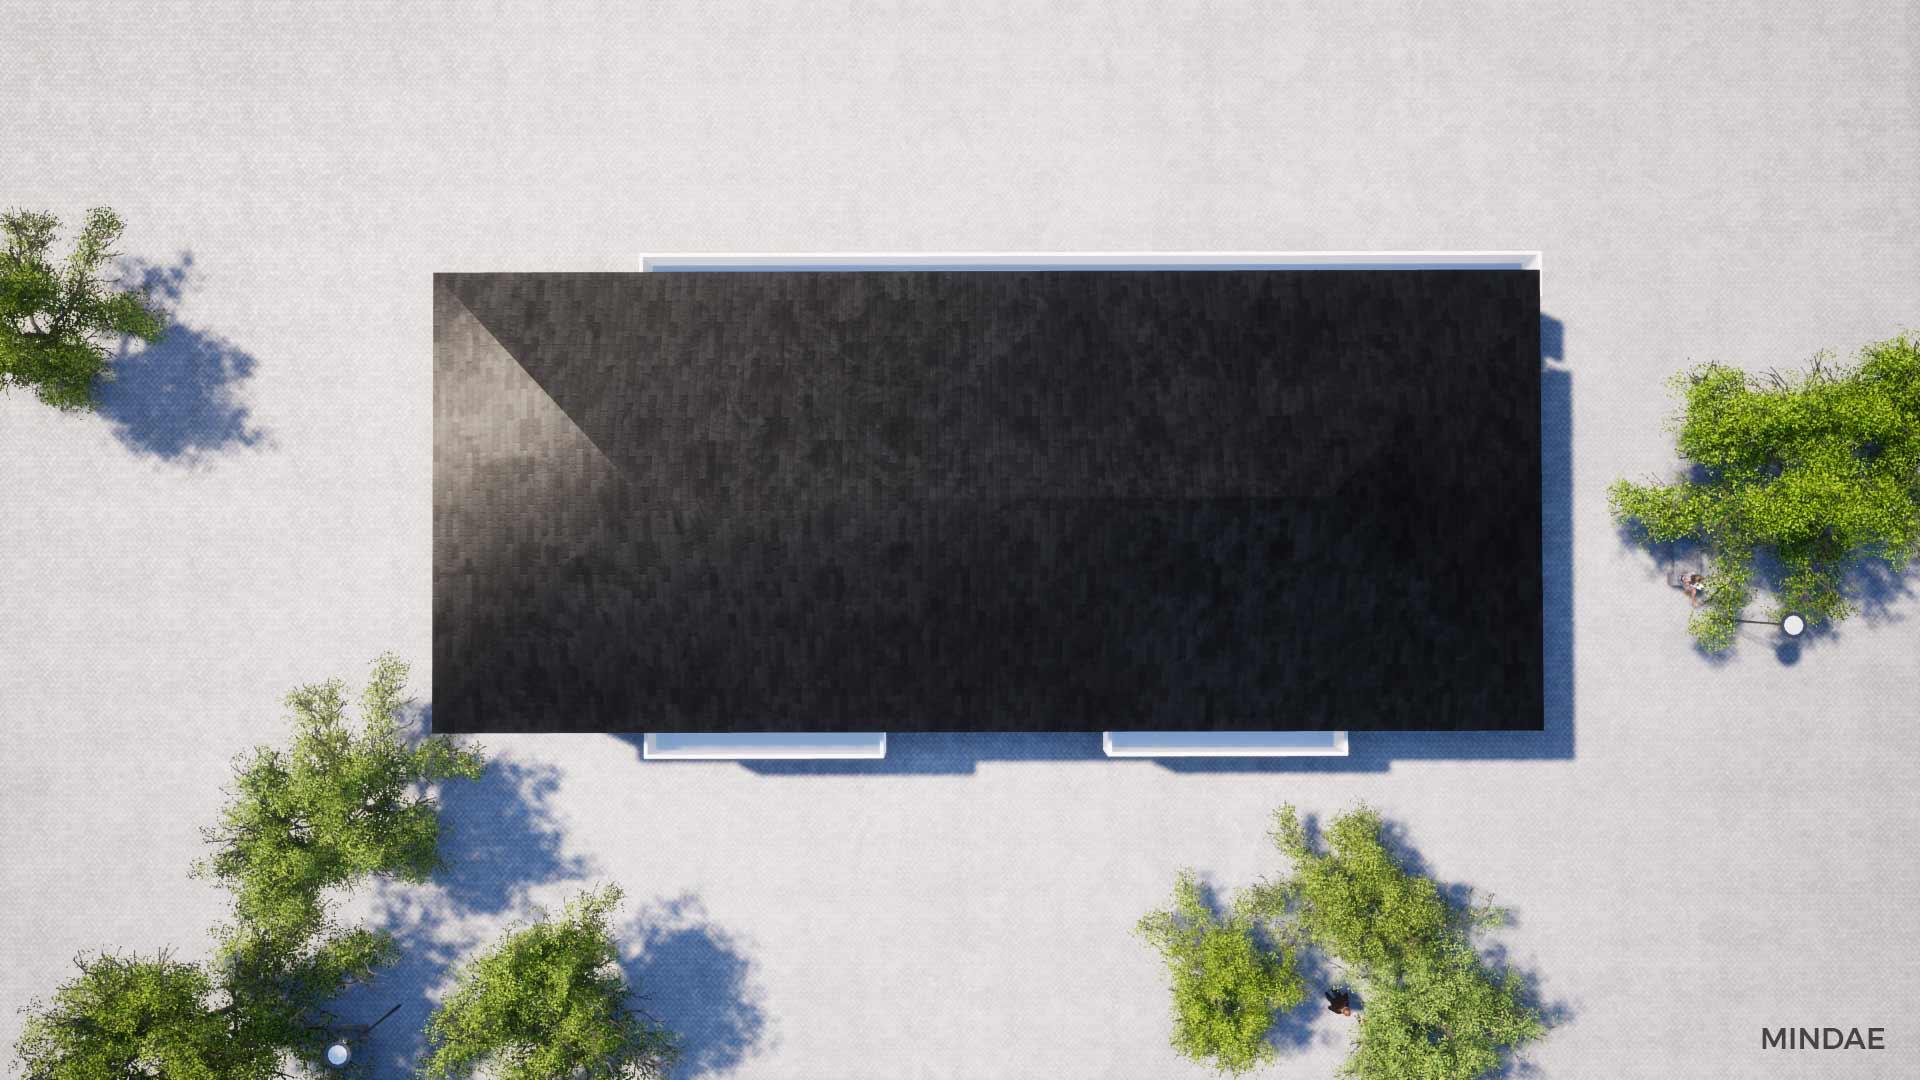 Mindae_immeuble_parapharmacie_devanture_enseigne_3D_facade-(3)